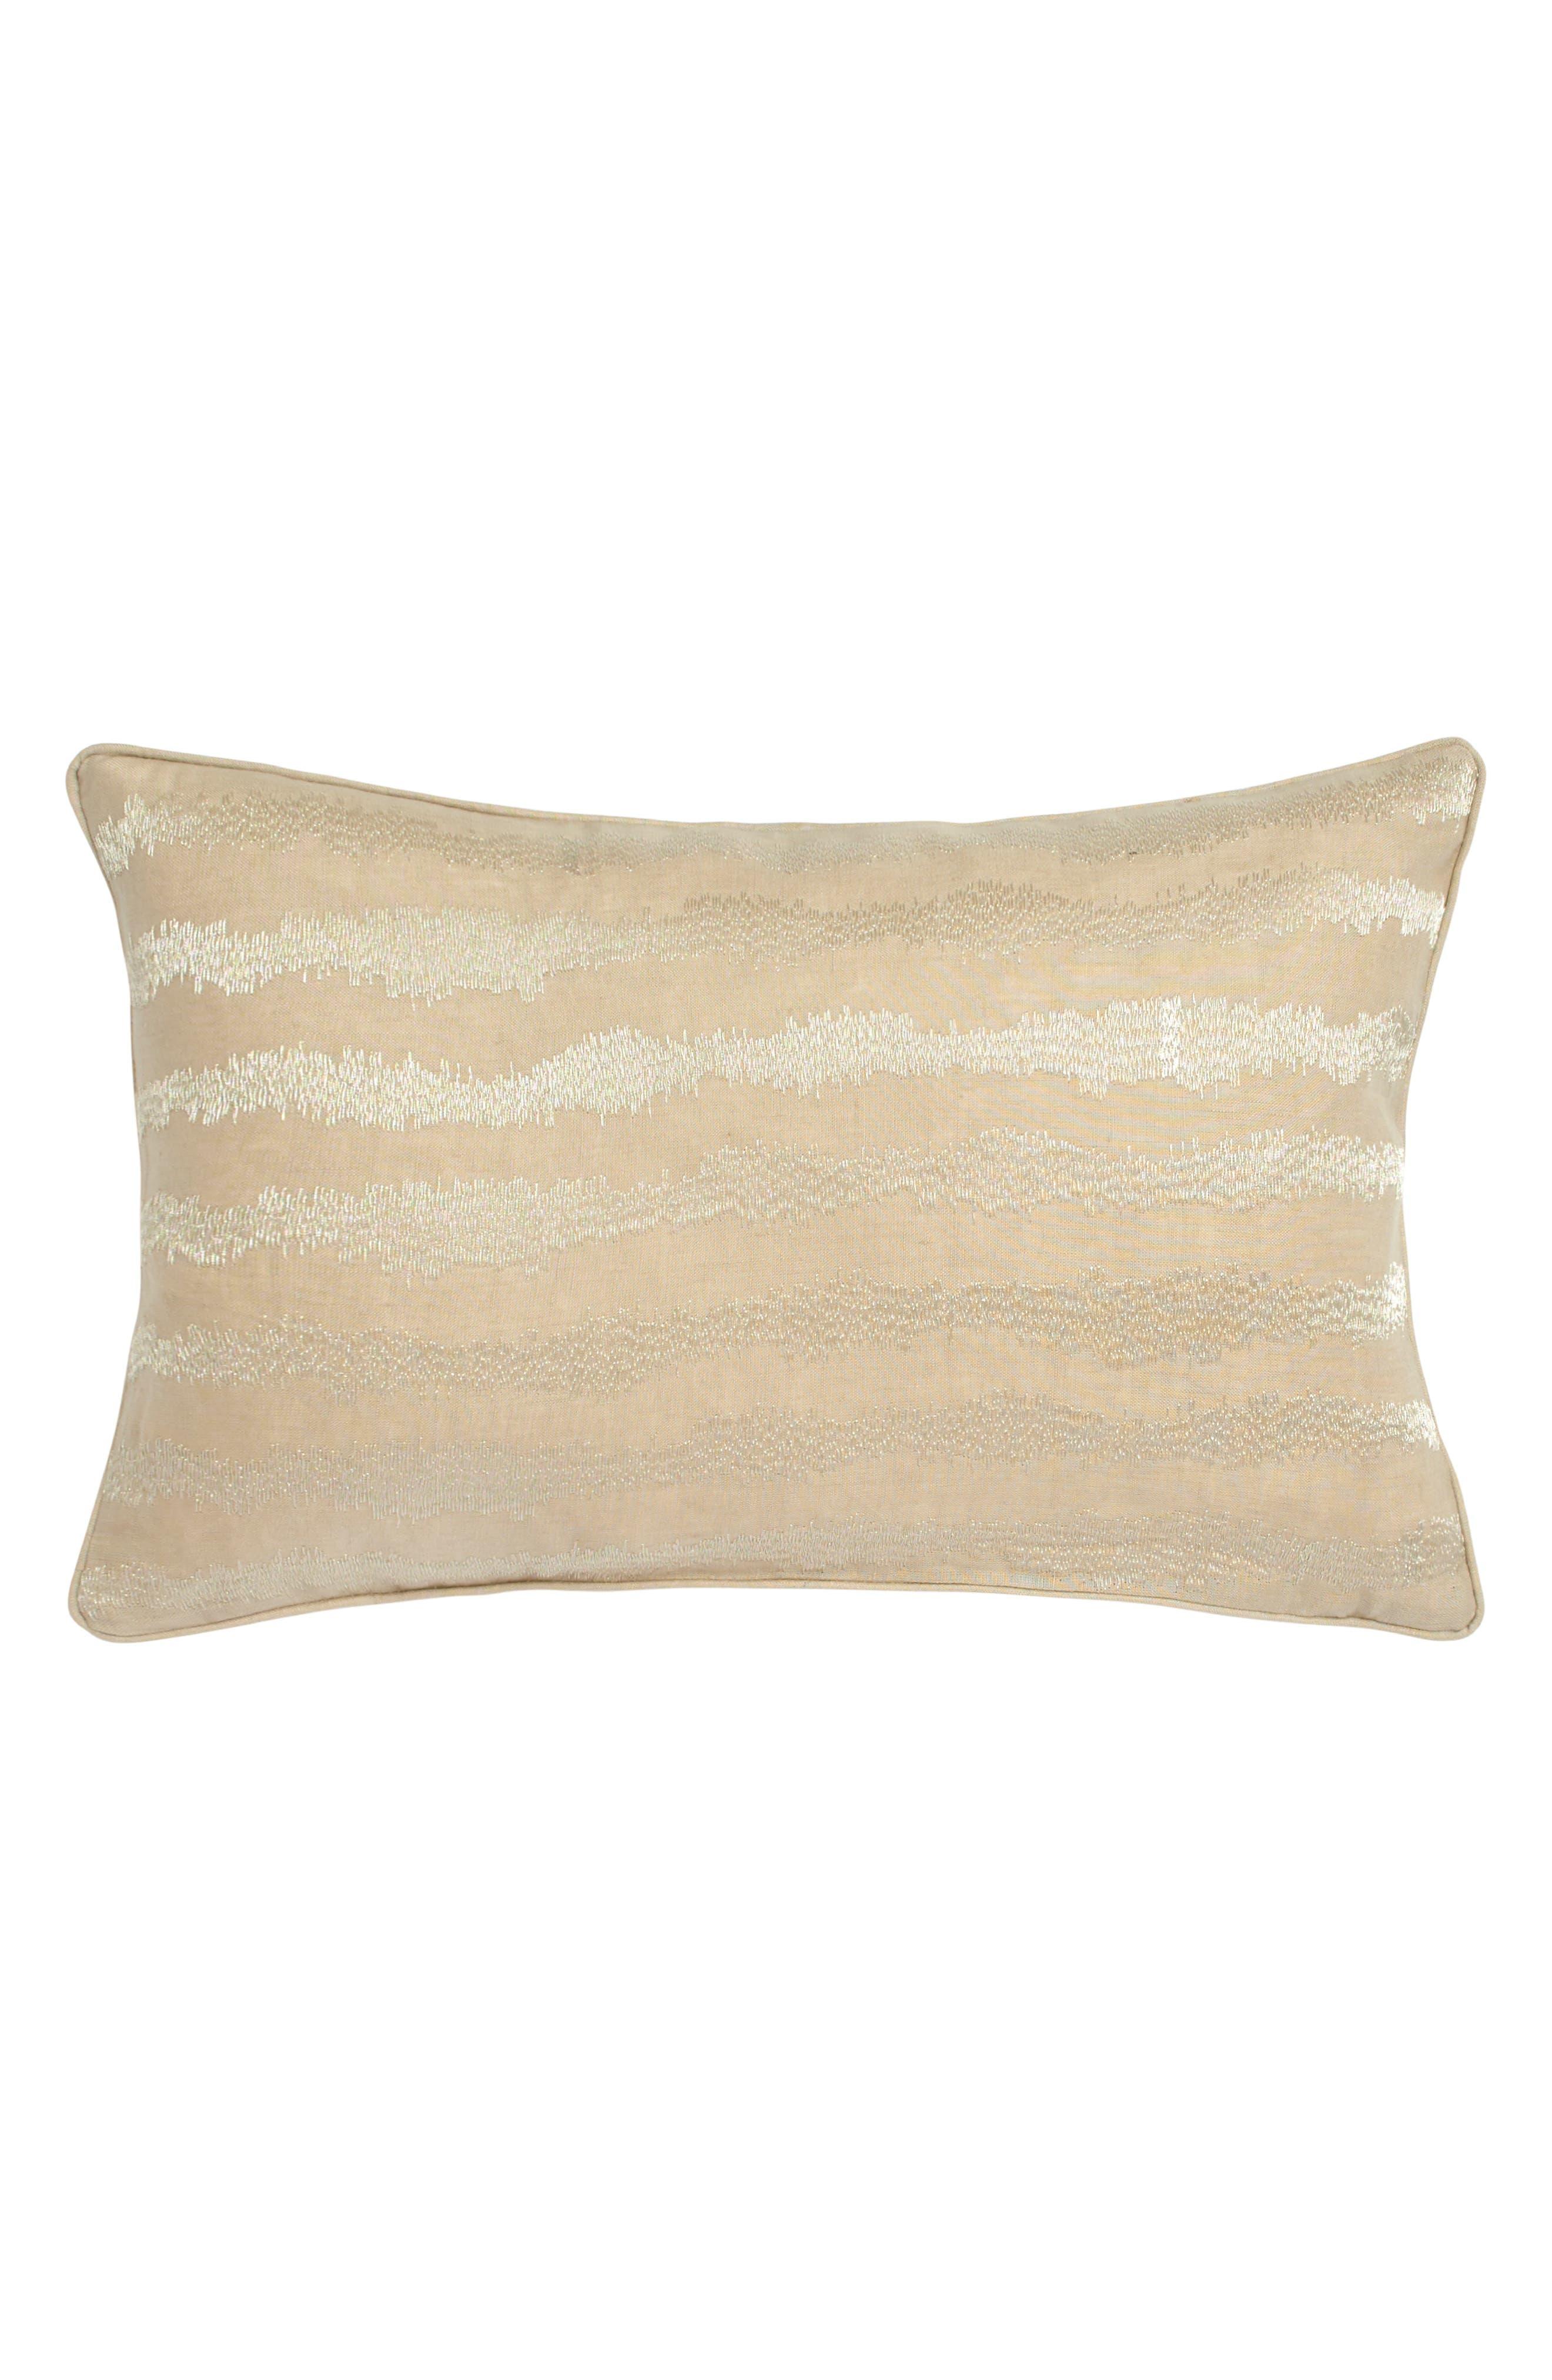 Alternate Image 1 Selected - Harlequin Makrana Accent Pillow